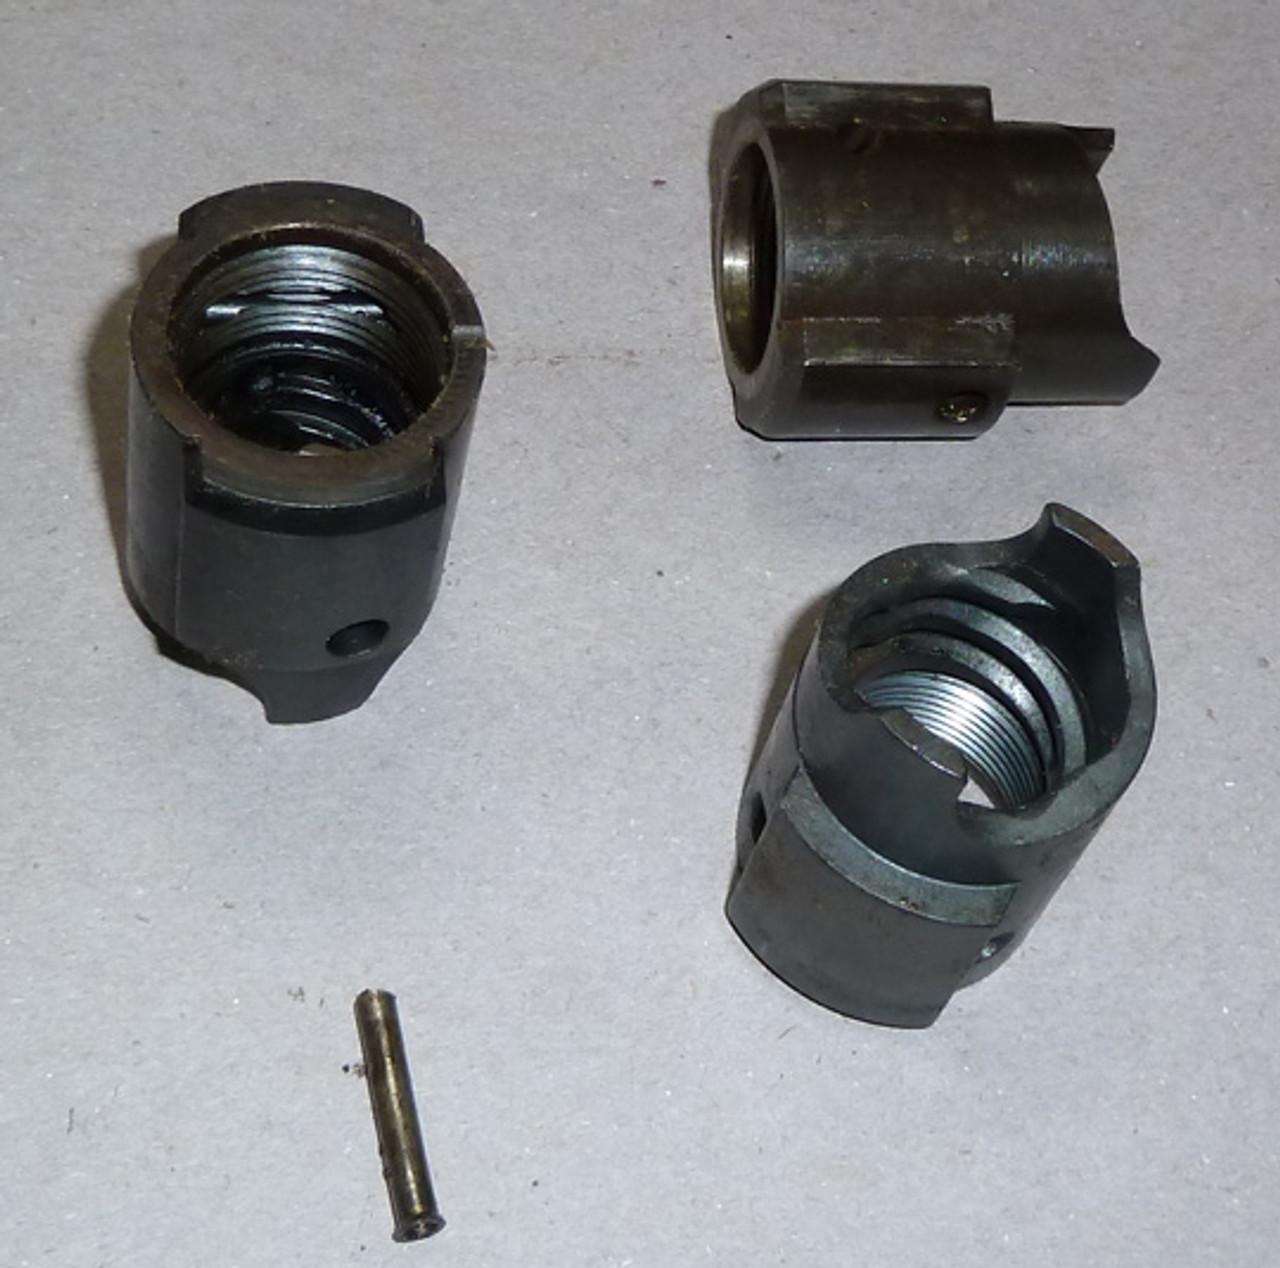 MG34 Barrel Collar